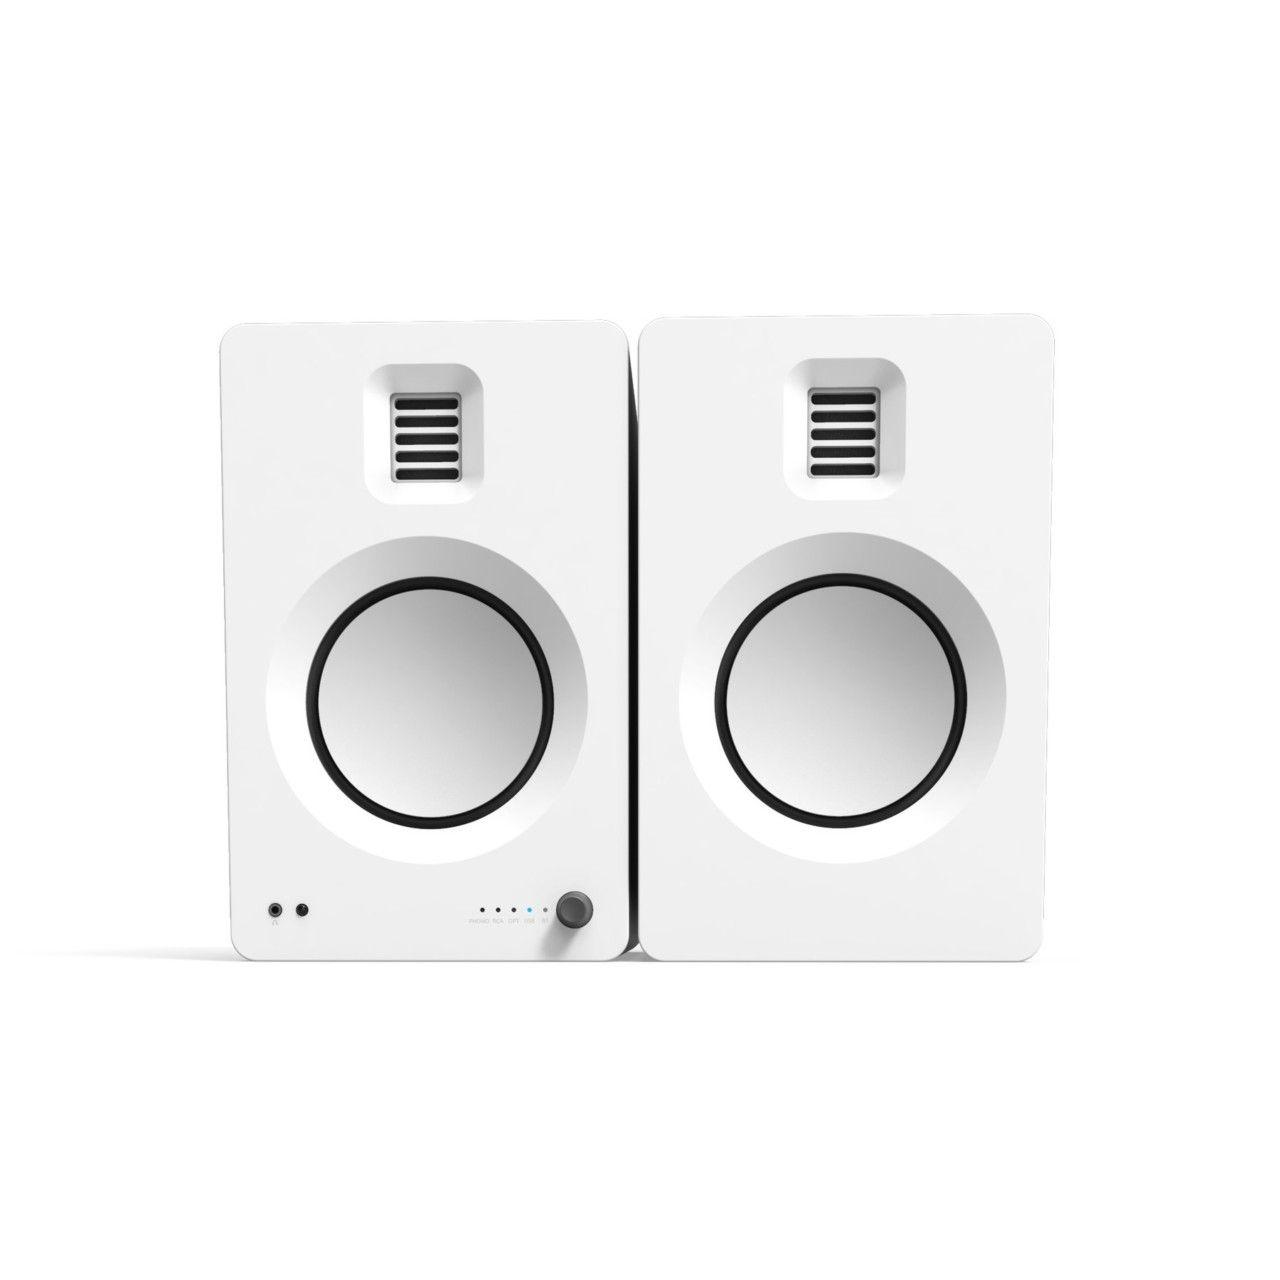 Kanto TUK Powered Speakers Simplifies Connectivity - Design Milk